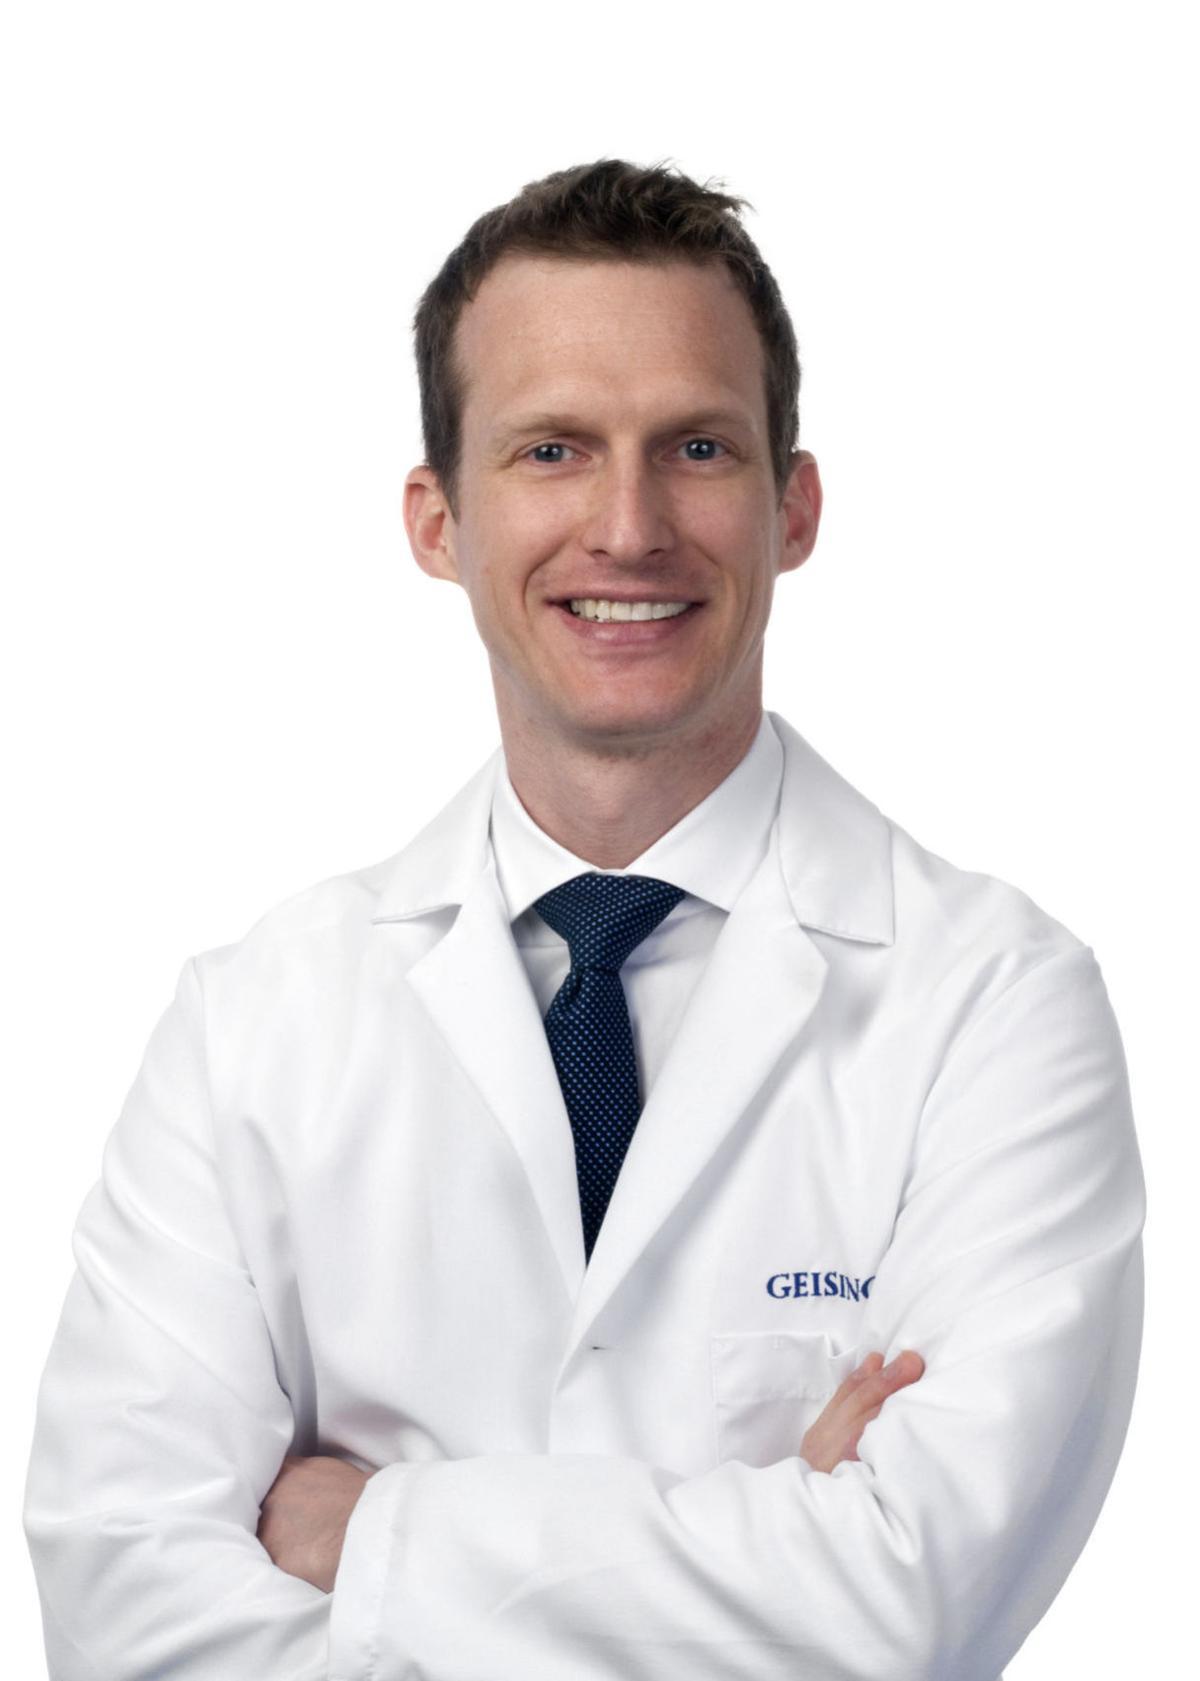 Clemens Schirmer, MD